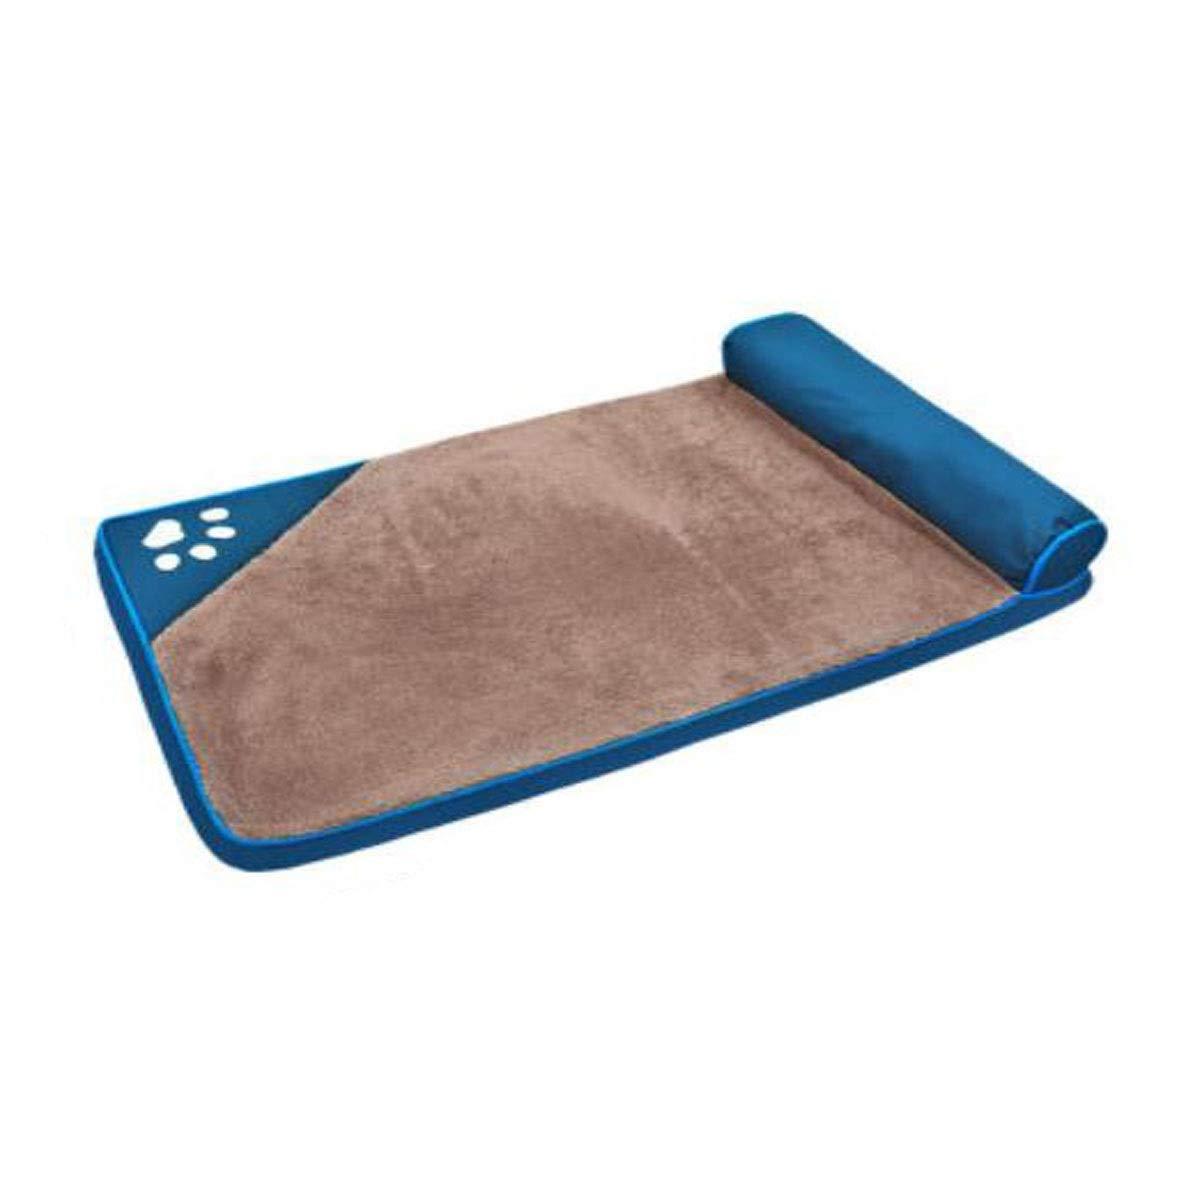 Light blue L Jiansheng Dog Bed, Large and Medium Dog Ortopedia Addormentata, Weable Folding on the Floor, Car Dog Cage, Dark Blue, Light Blue L (Colore: Blu  aro, Dimensione: L)